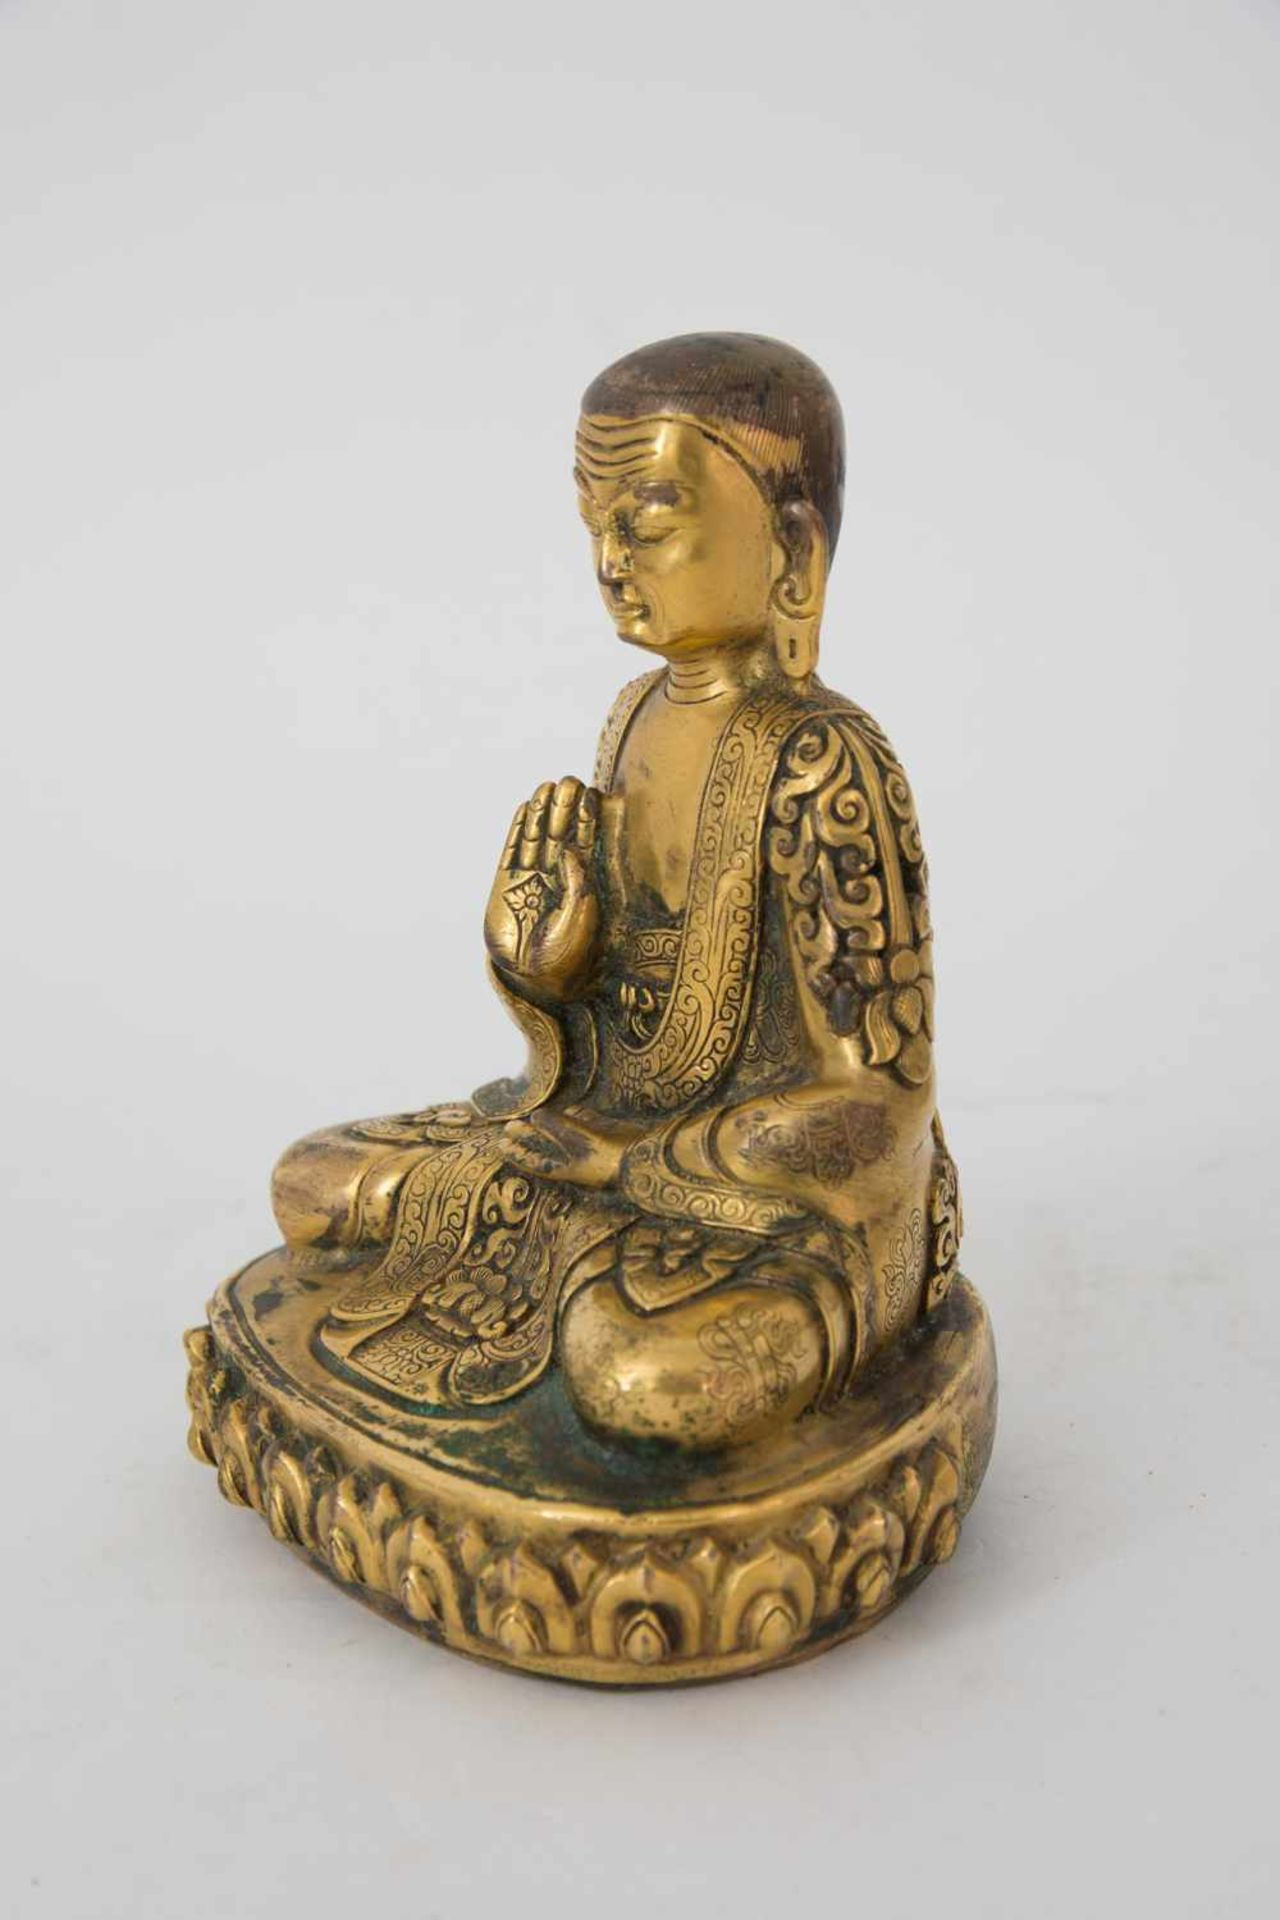 Los 12 - ADIBUDDHA SCULPTURE, firegilt bronze, Central Asia Sculpture finely elaborated, measurements: 12 x